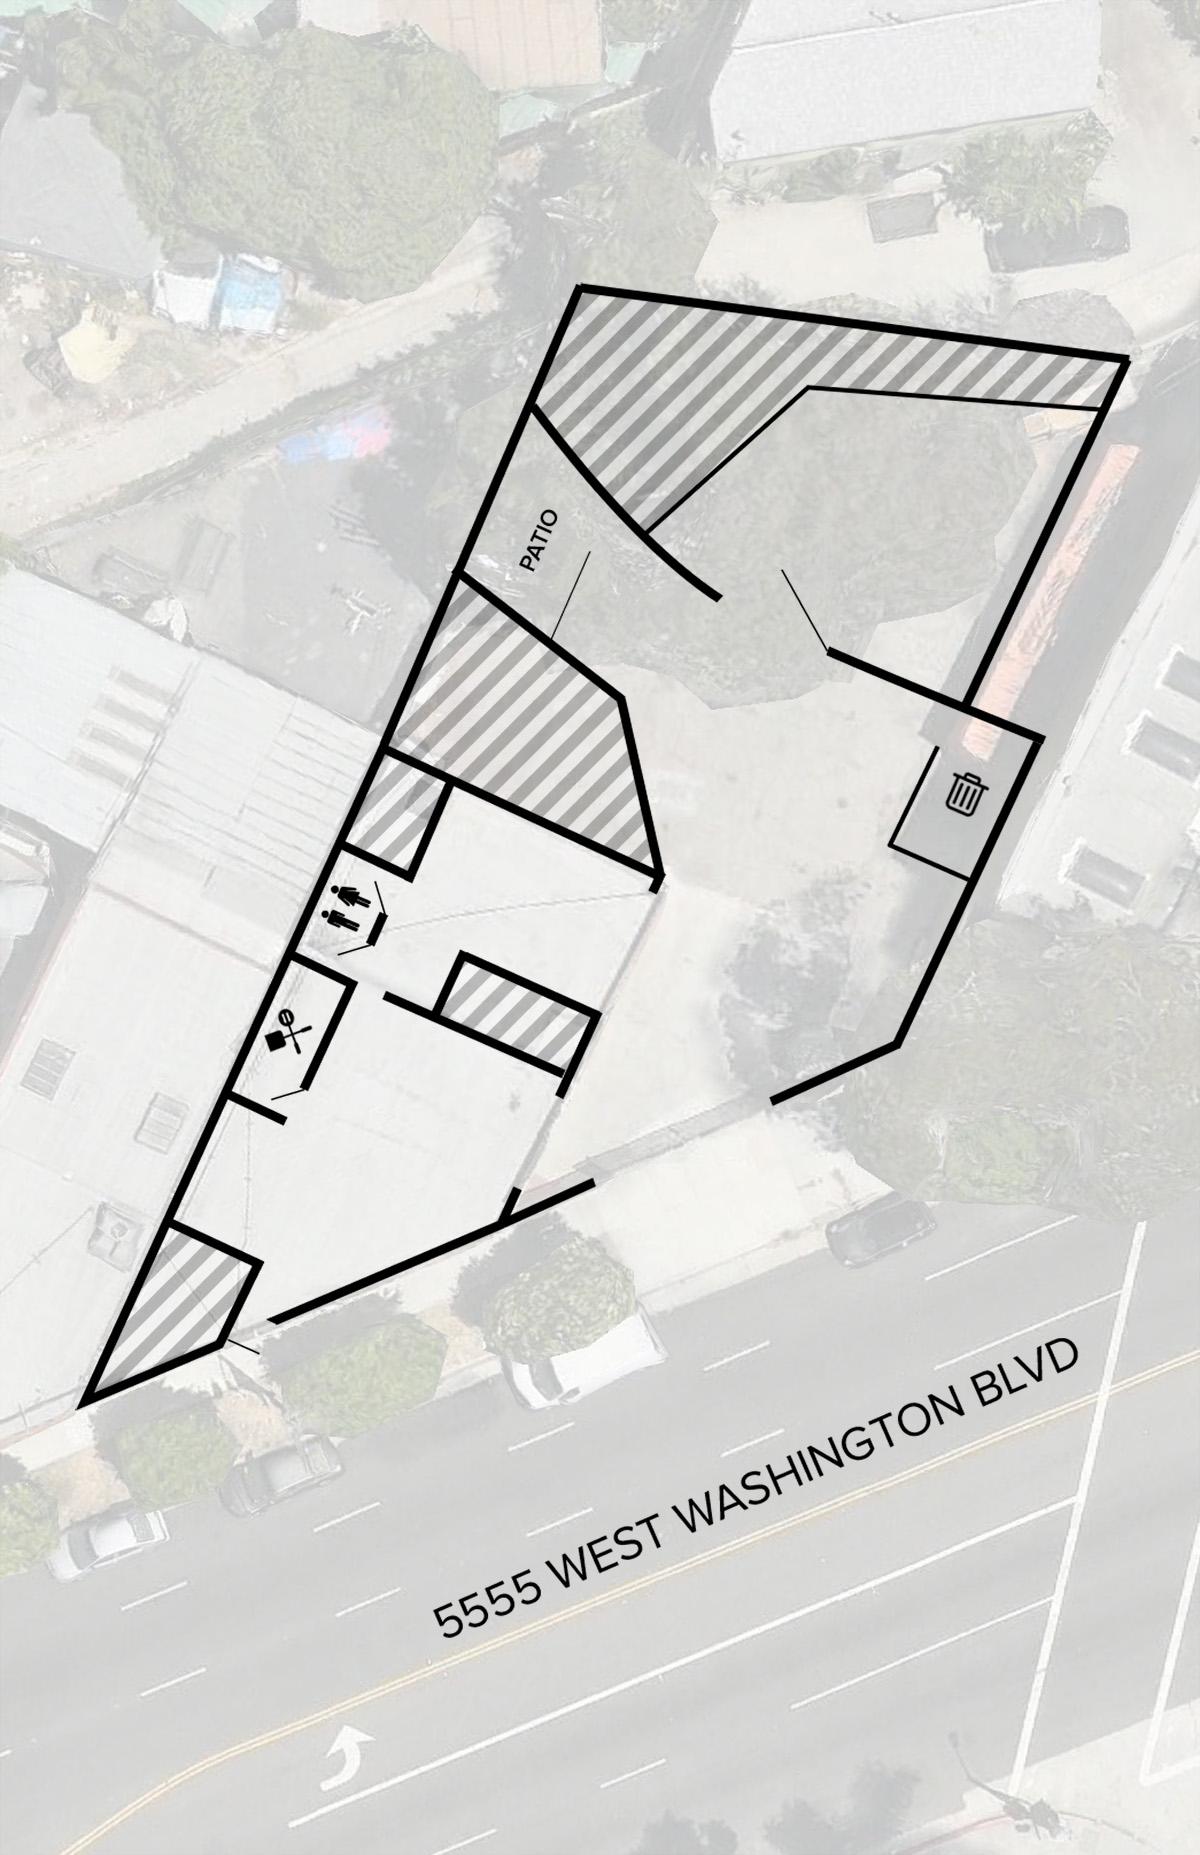 arthouse+los angeles venue floor+plan.jpg